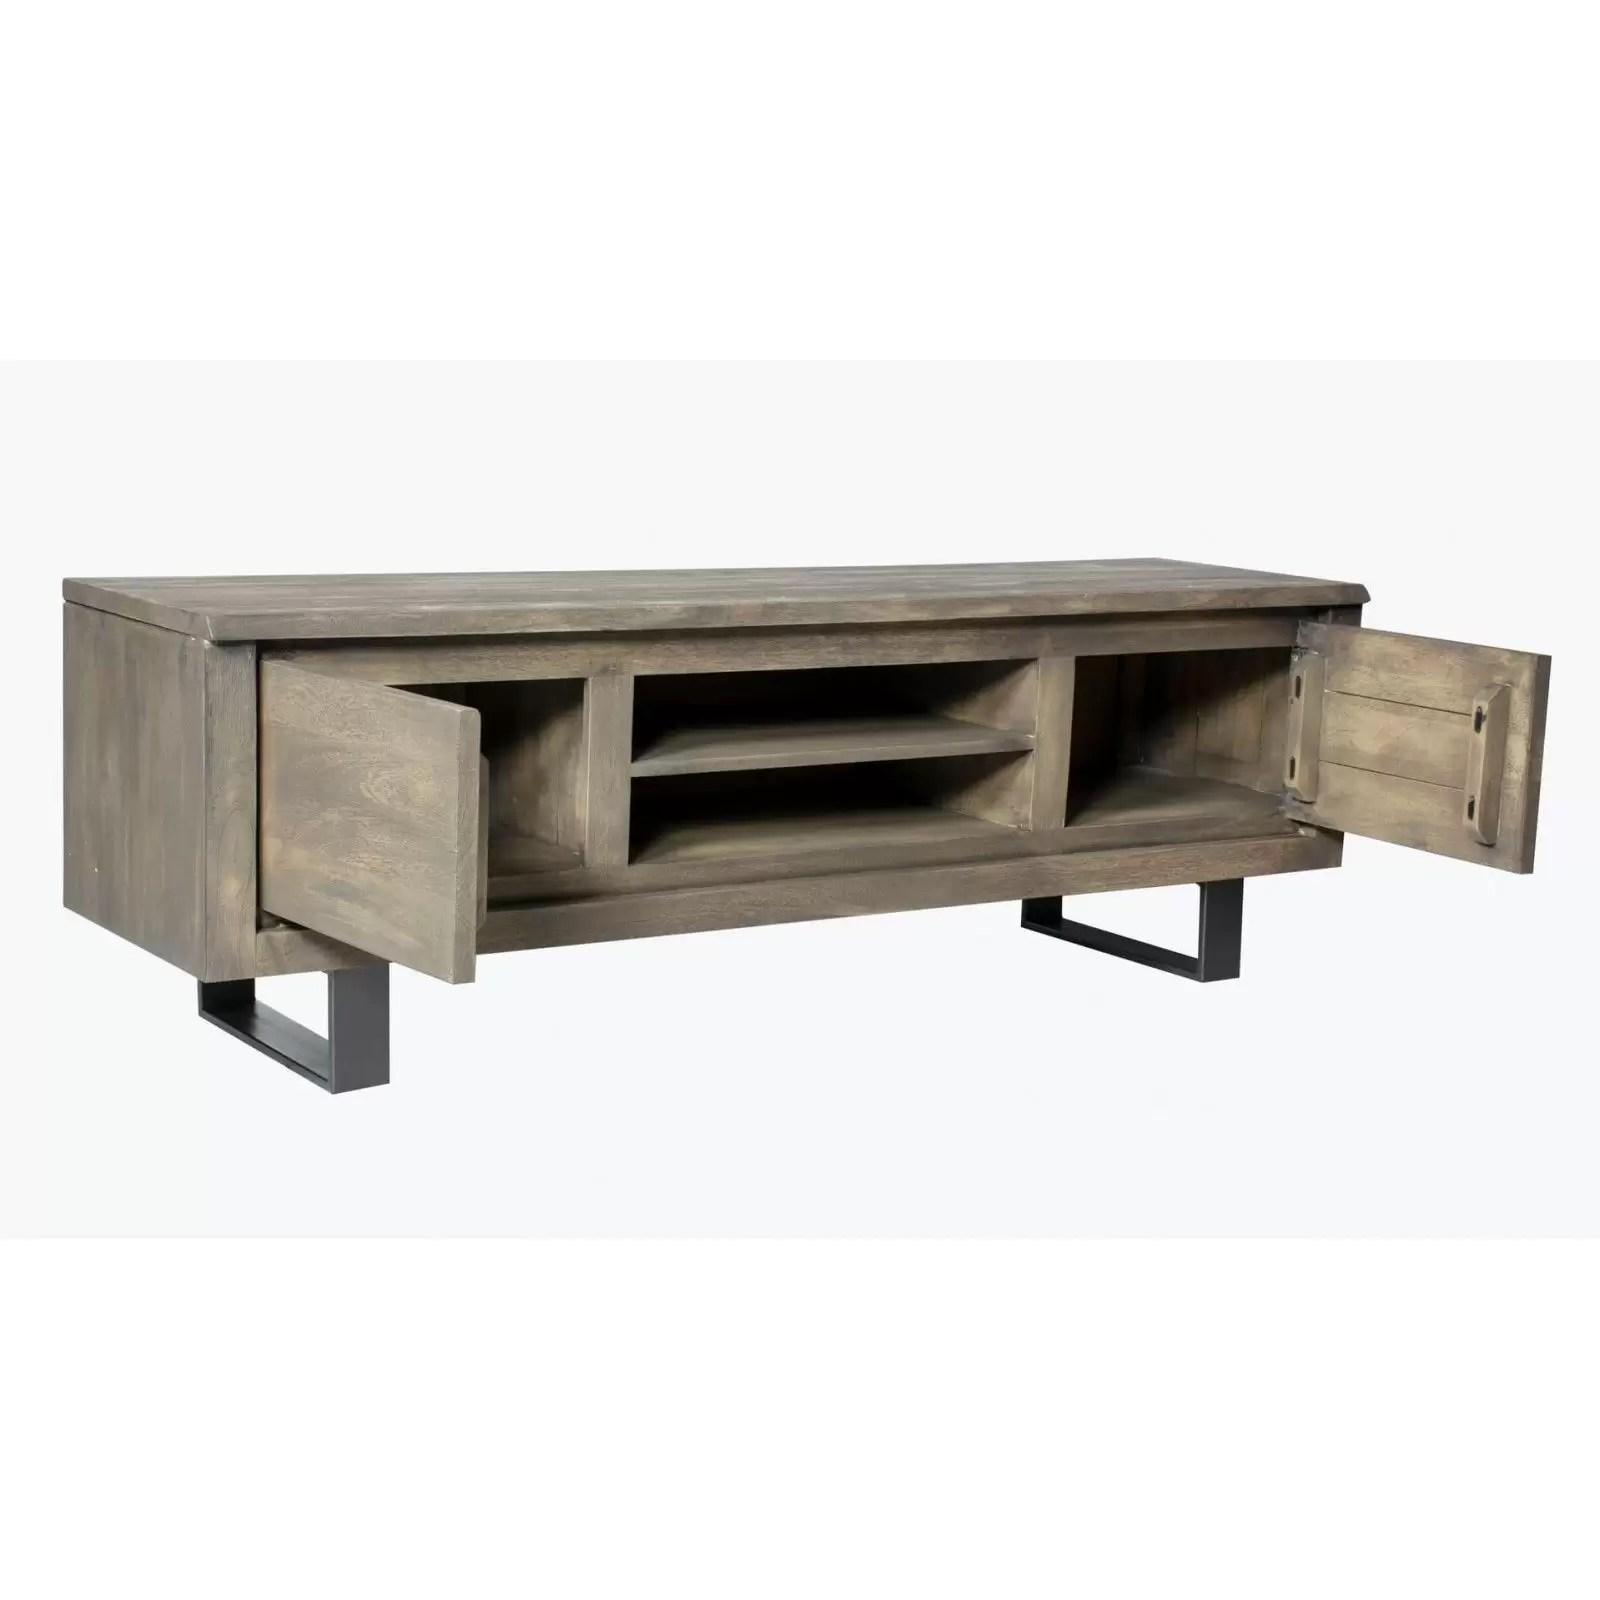 meuble tv new york en bois manguier massif 2 portes et 2 etageres